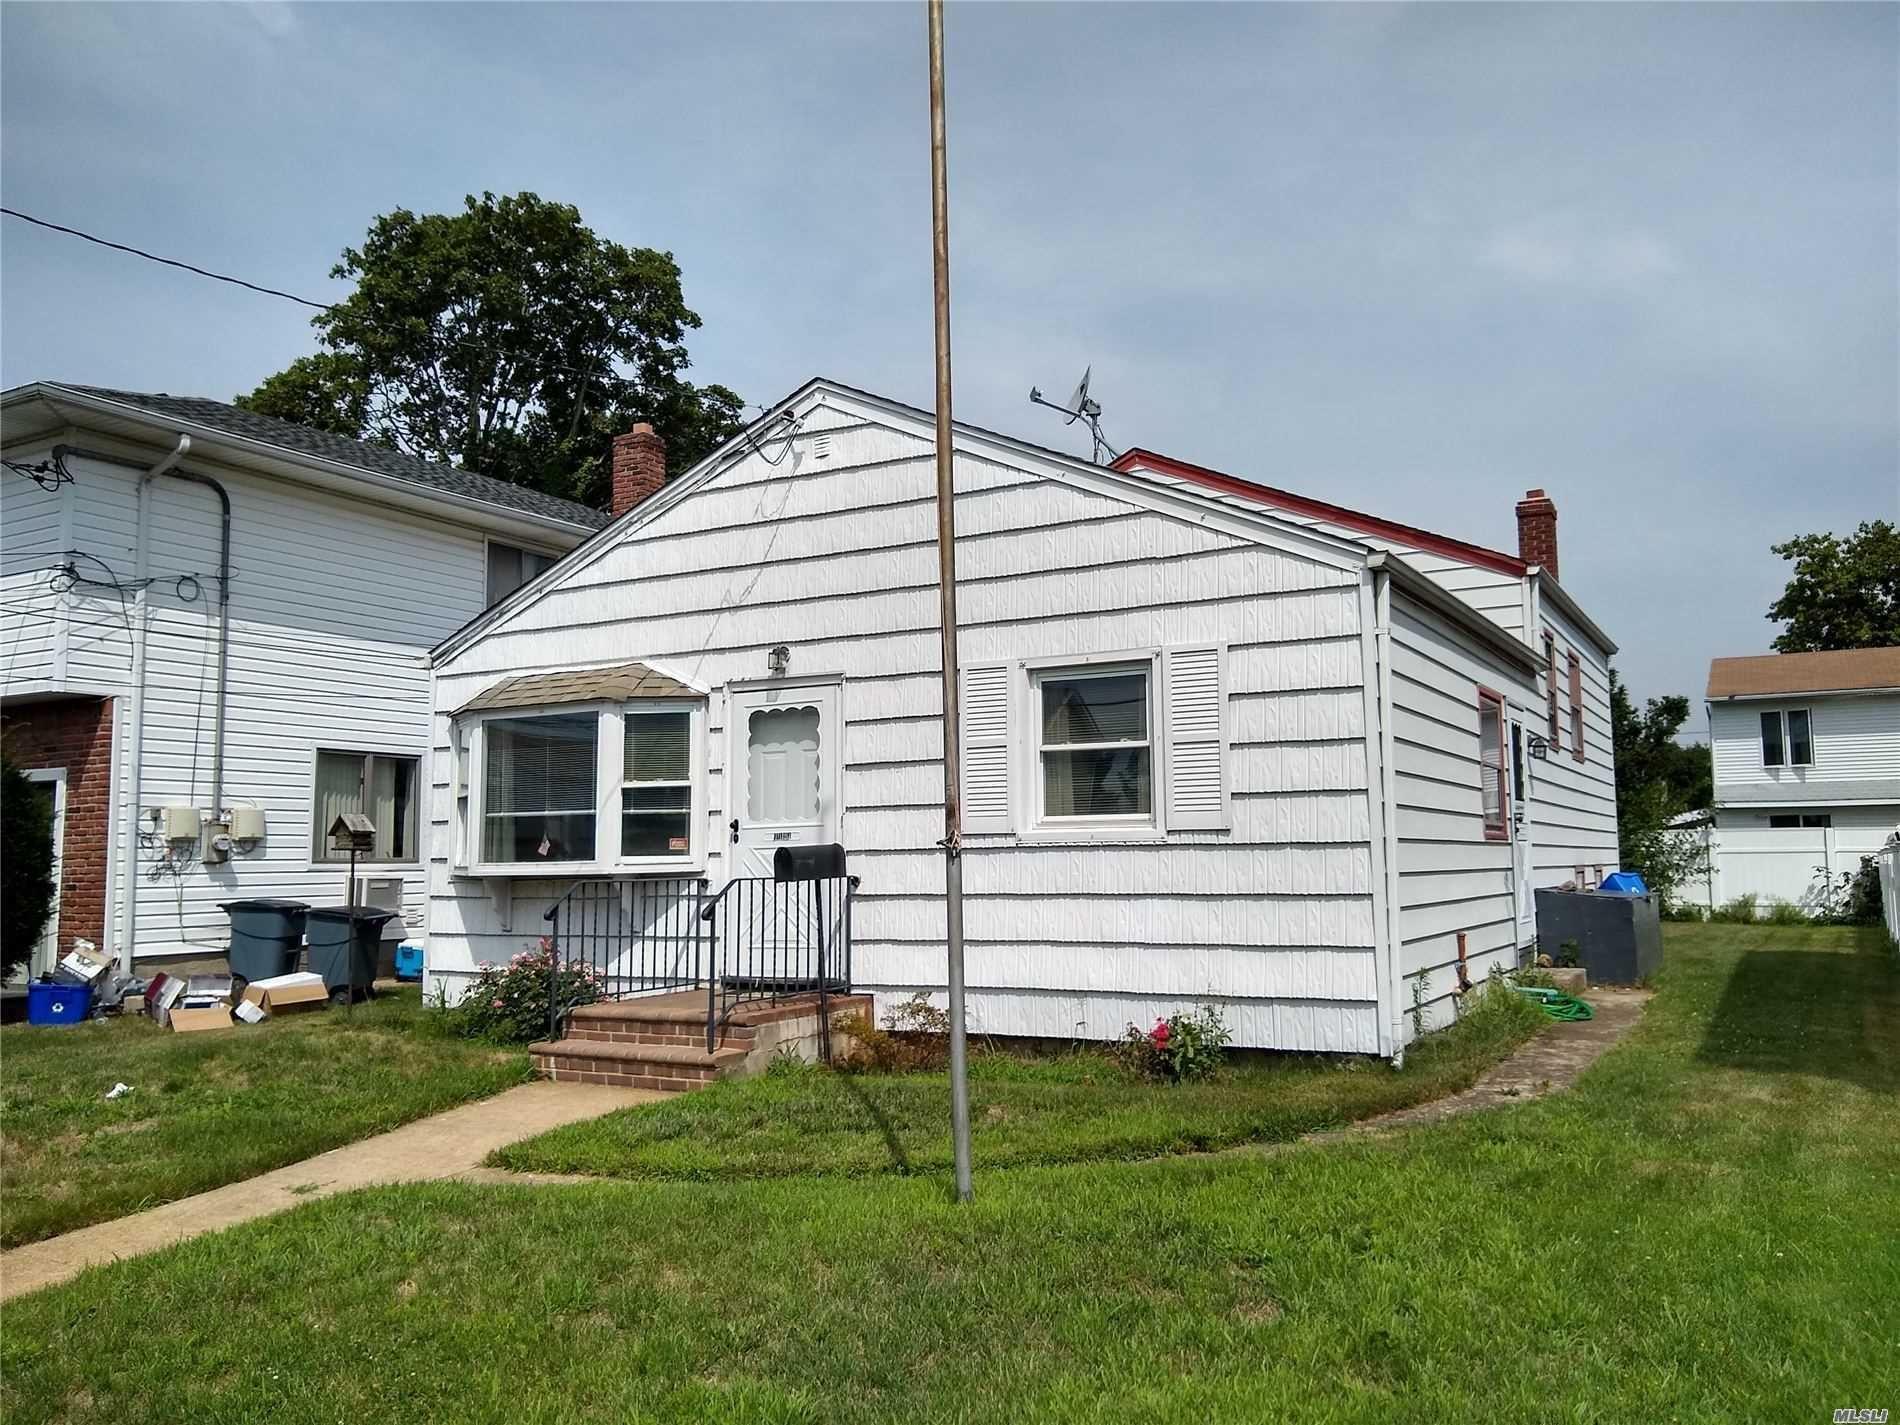 1121 Jefferson Pl, Baldwin, NY 11510 - MLS#: 3221659